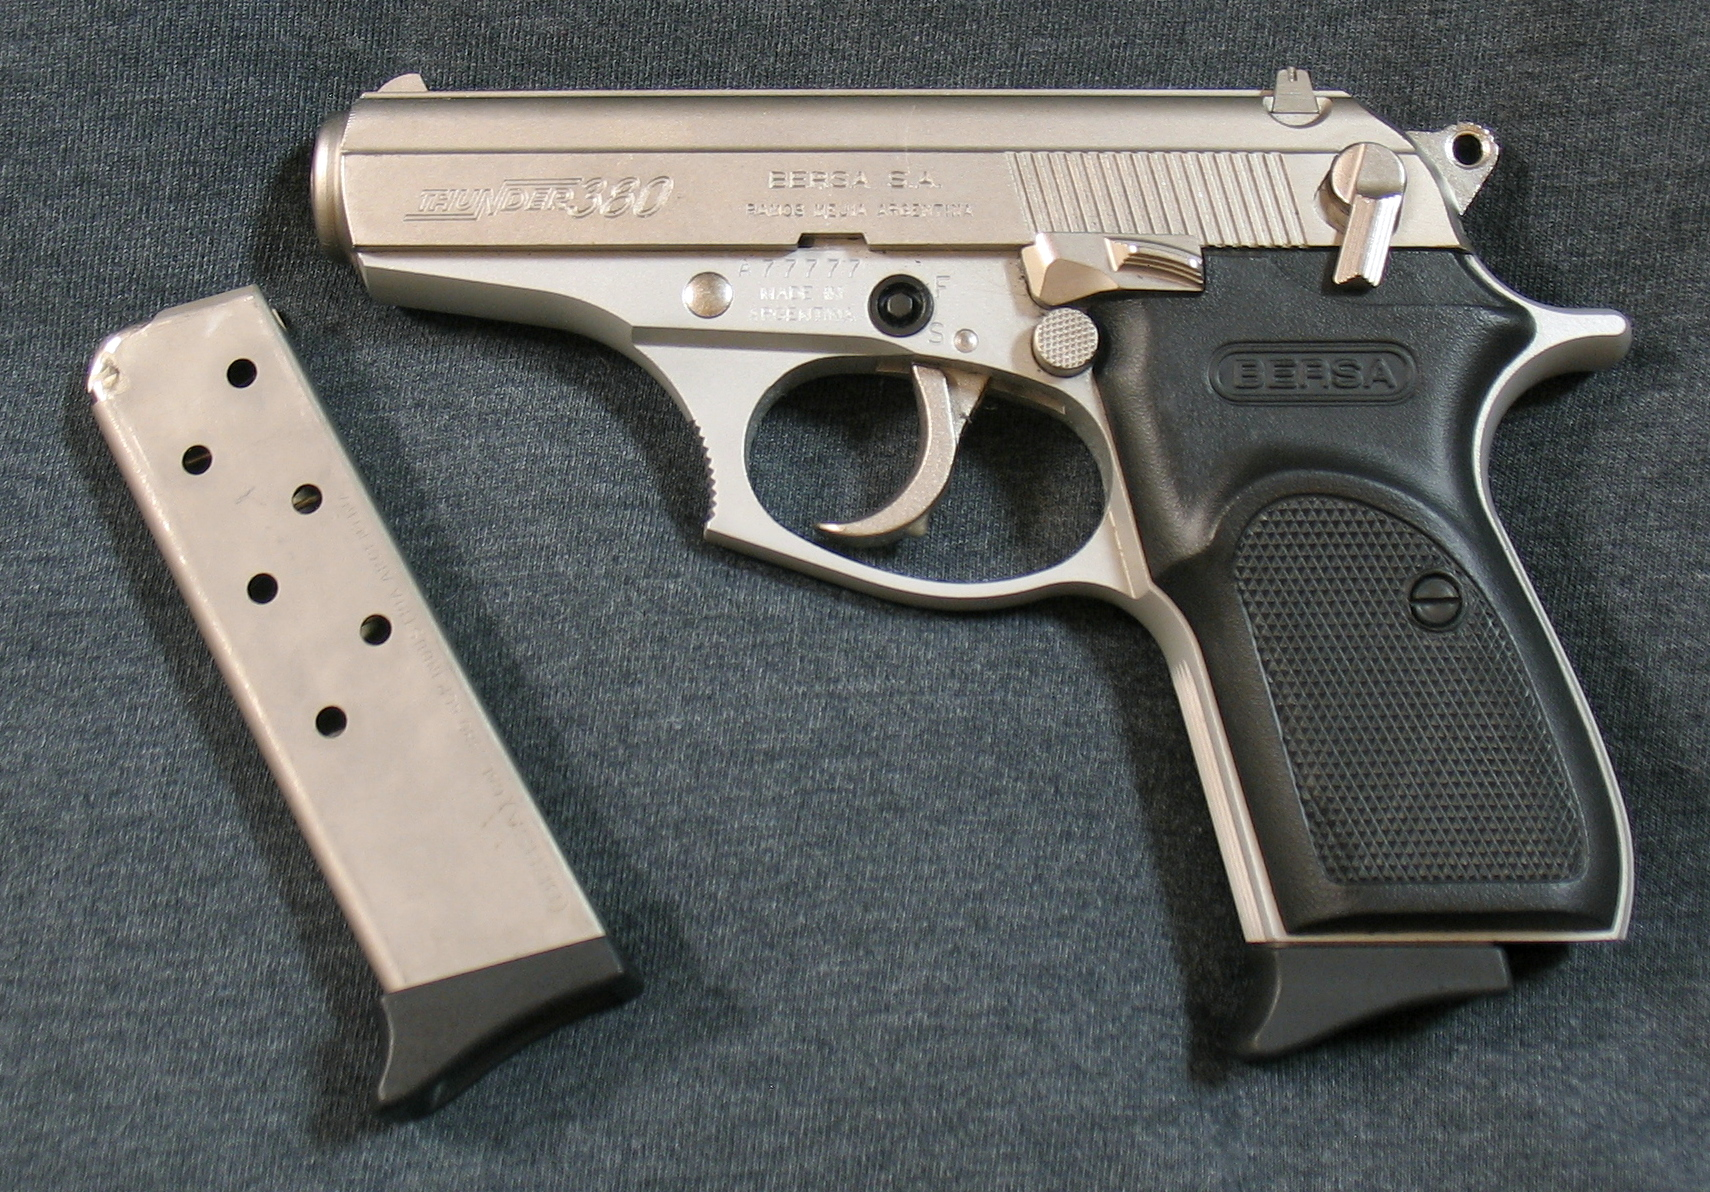 Armas de fuego parte 2: Pistolas - Info - Taringa!